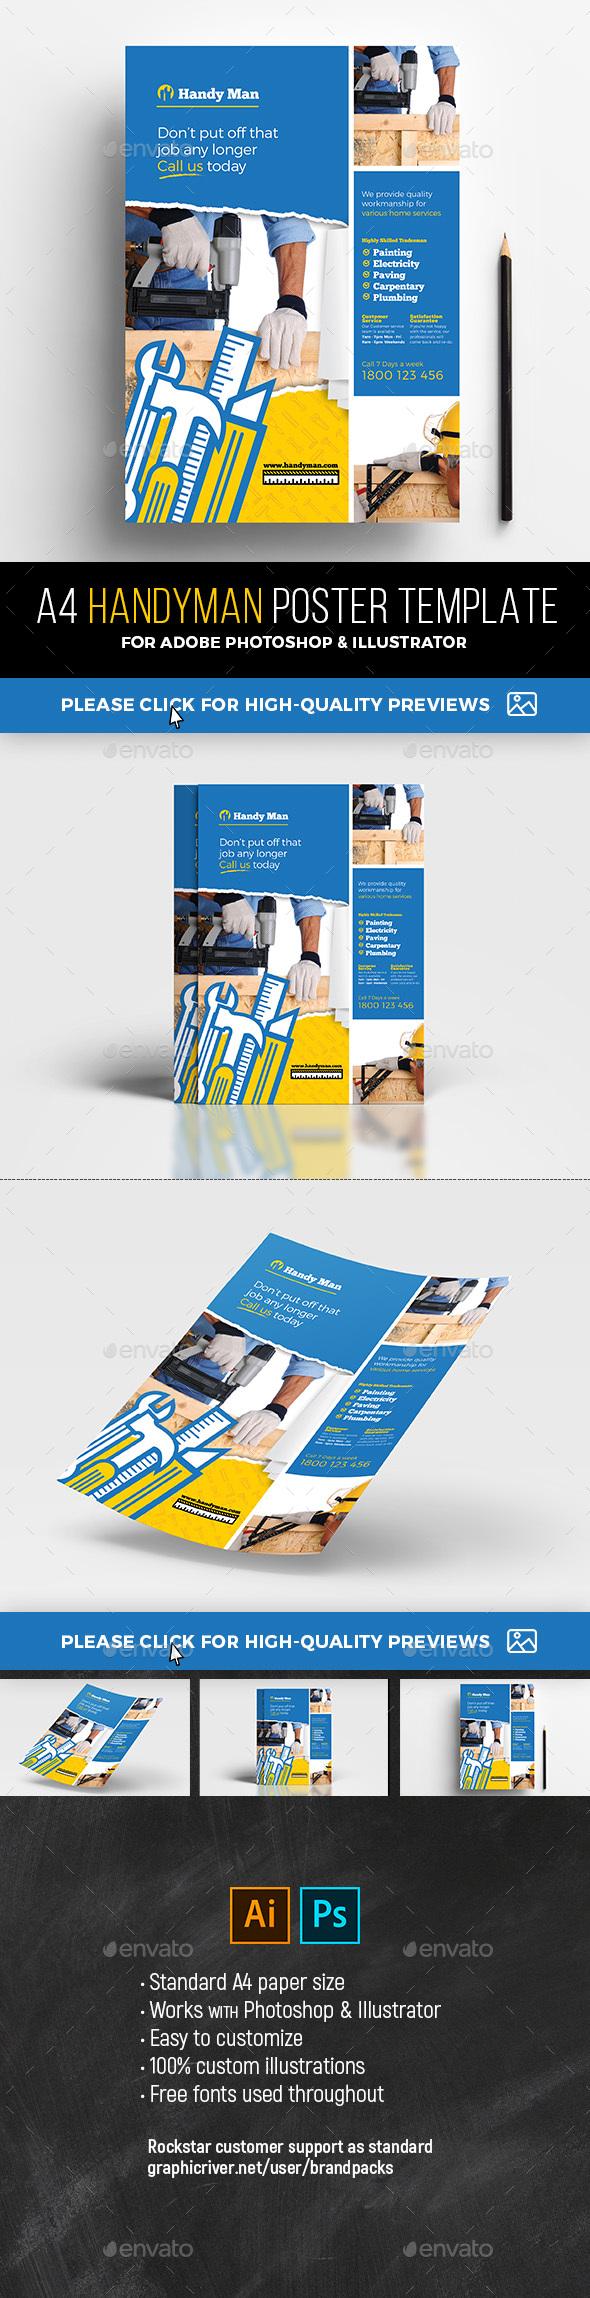 Handyman Poster Template v2 - Commerce Flyers